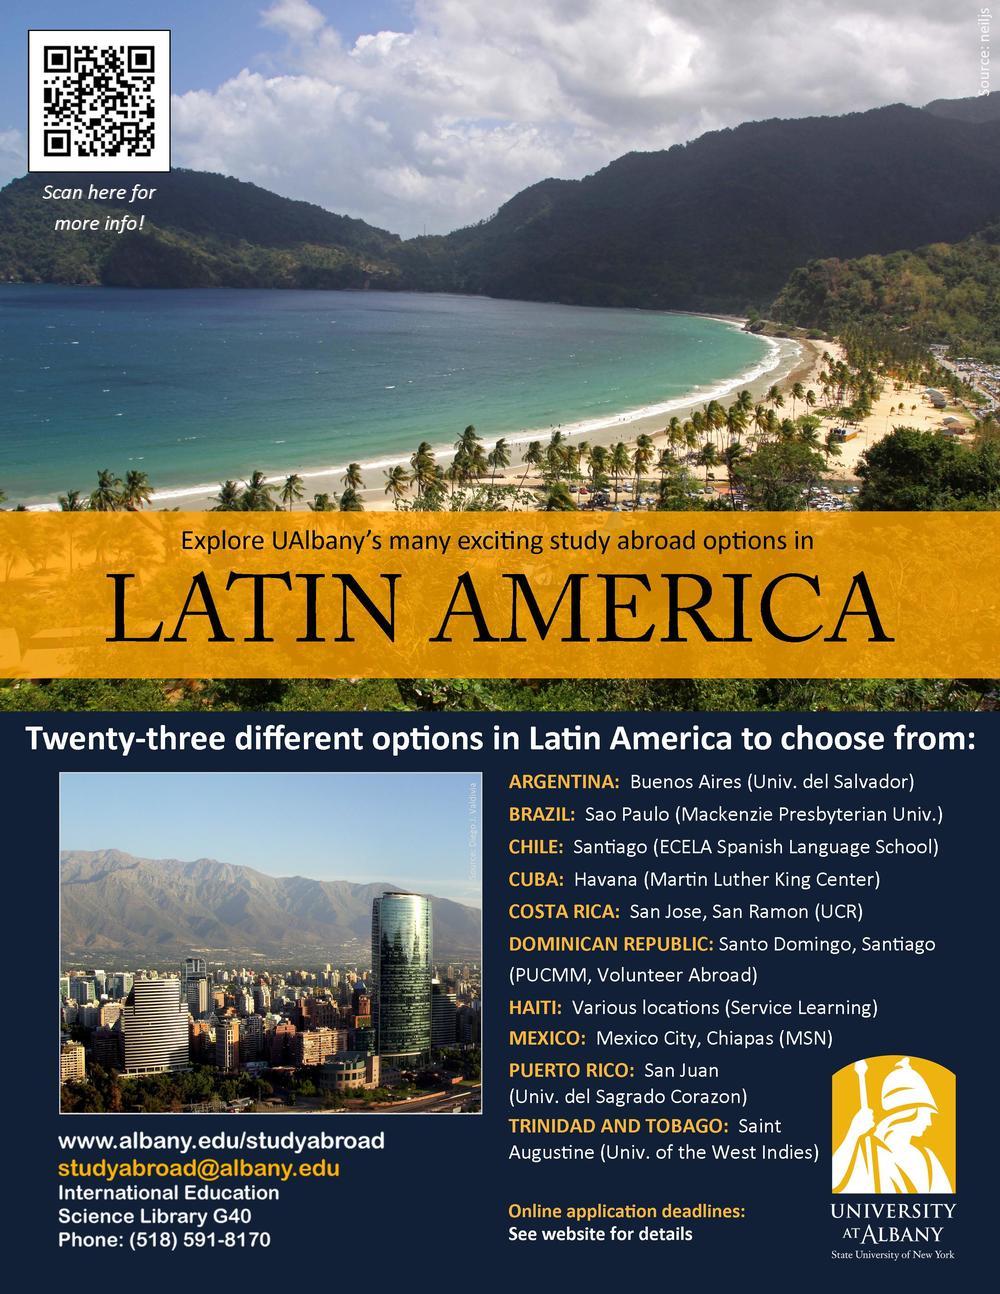 Latin America Flyer (No Map).jpg